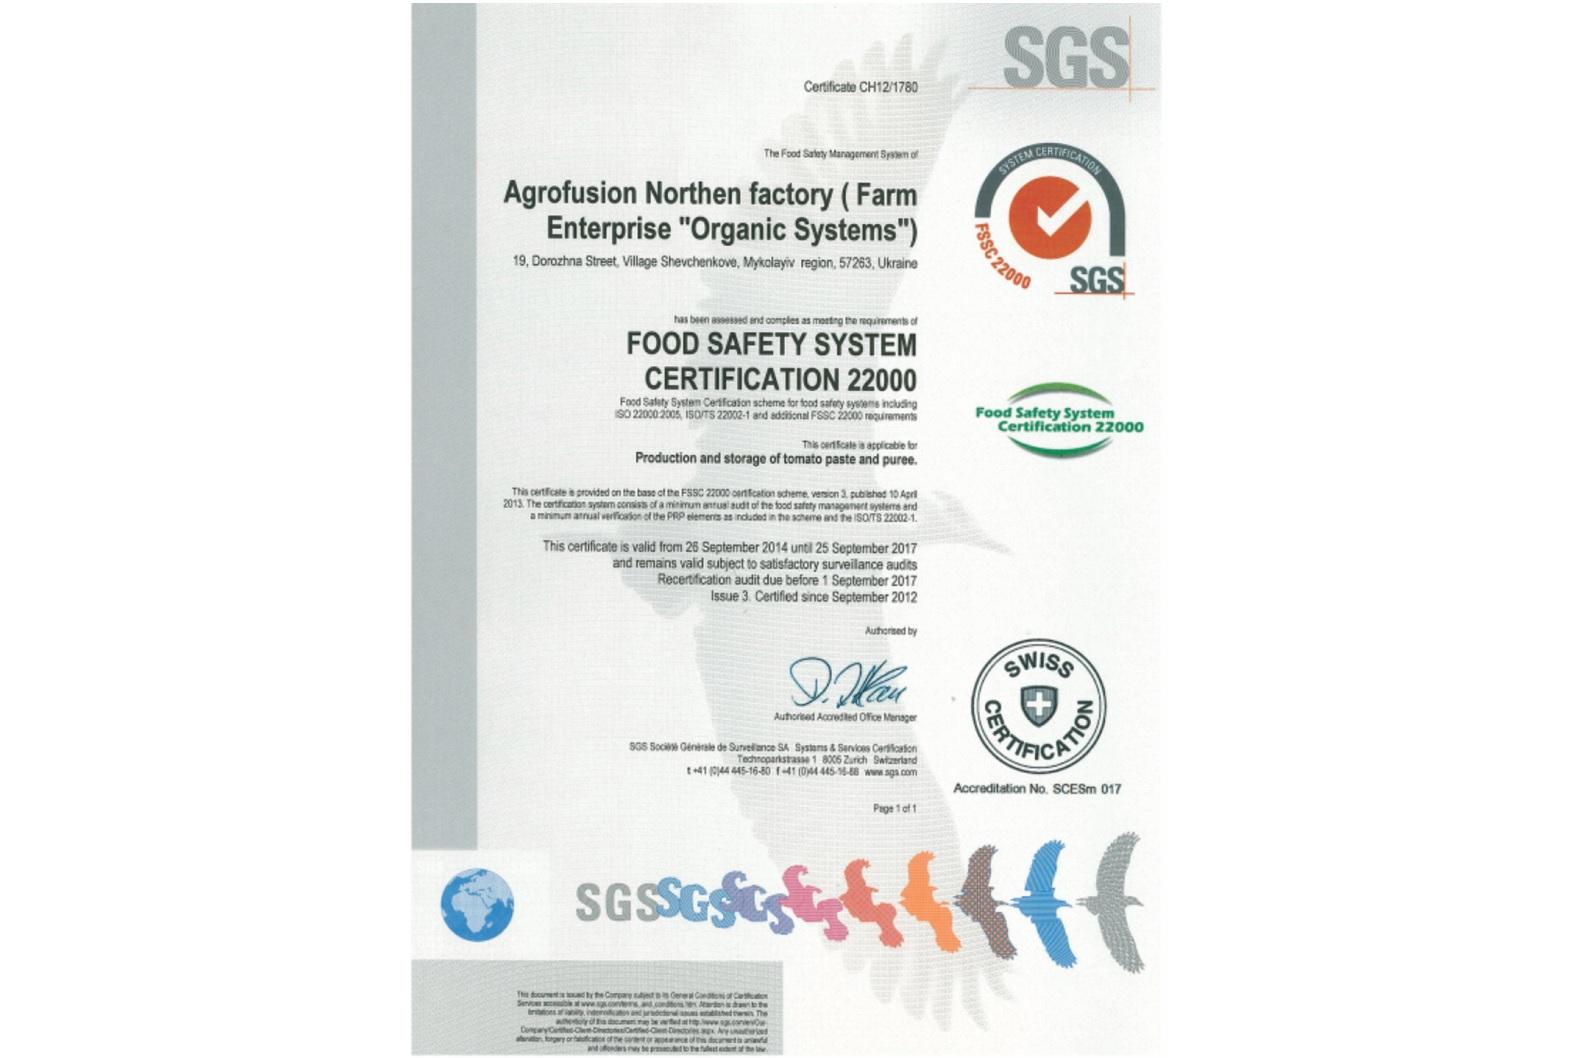 FSSC 22000. SURVEILLANCE AUDIT COMPLETED